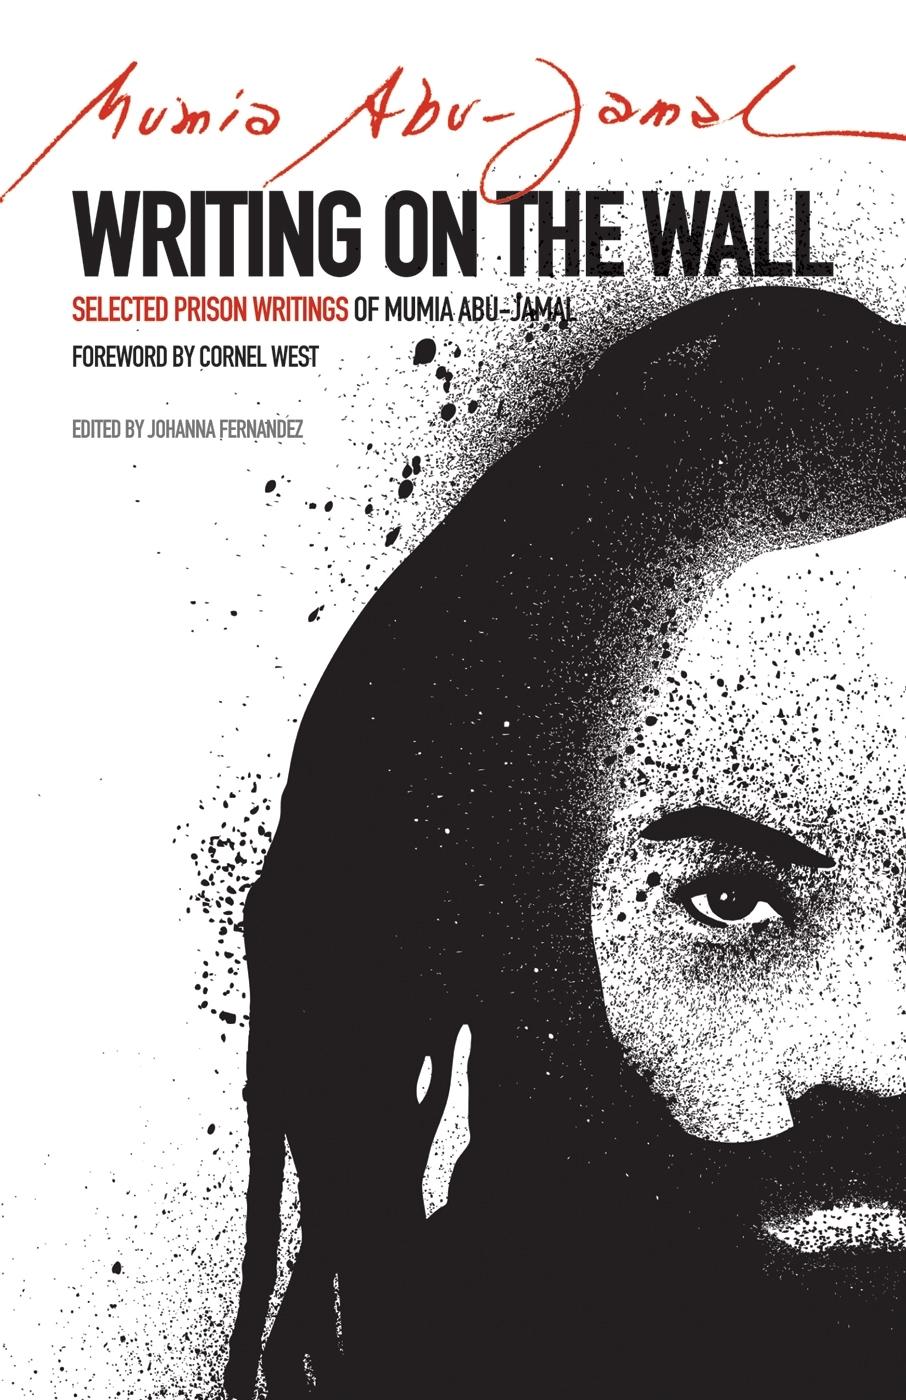 Mumia Abu-Jamal's Eighth Book: Writing on the Wall